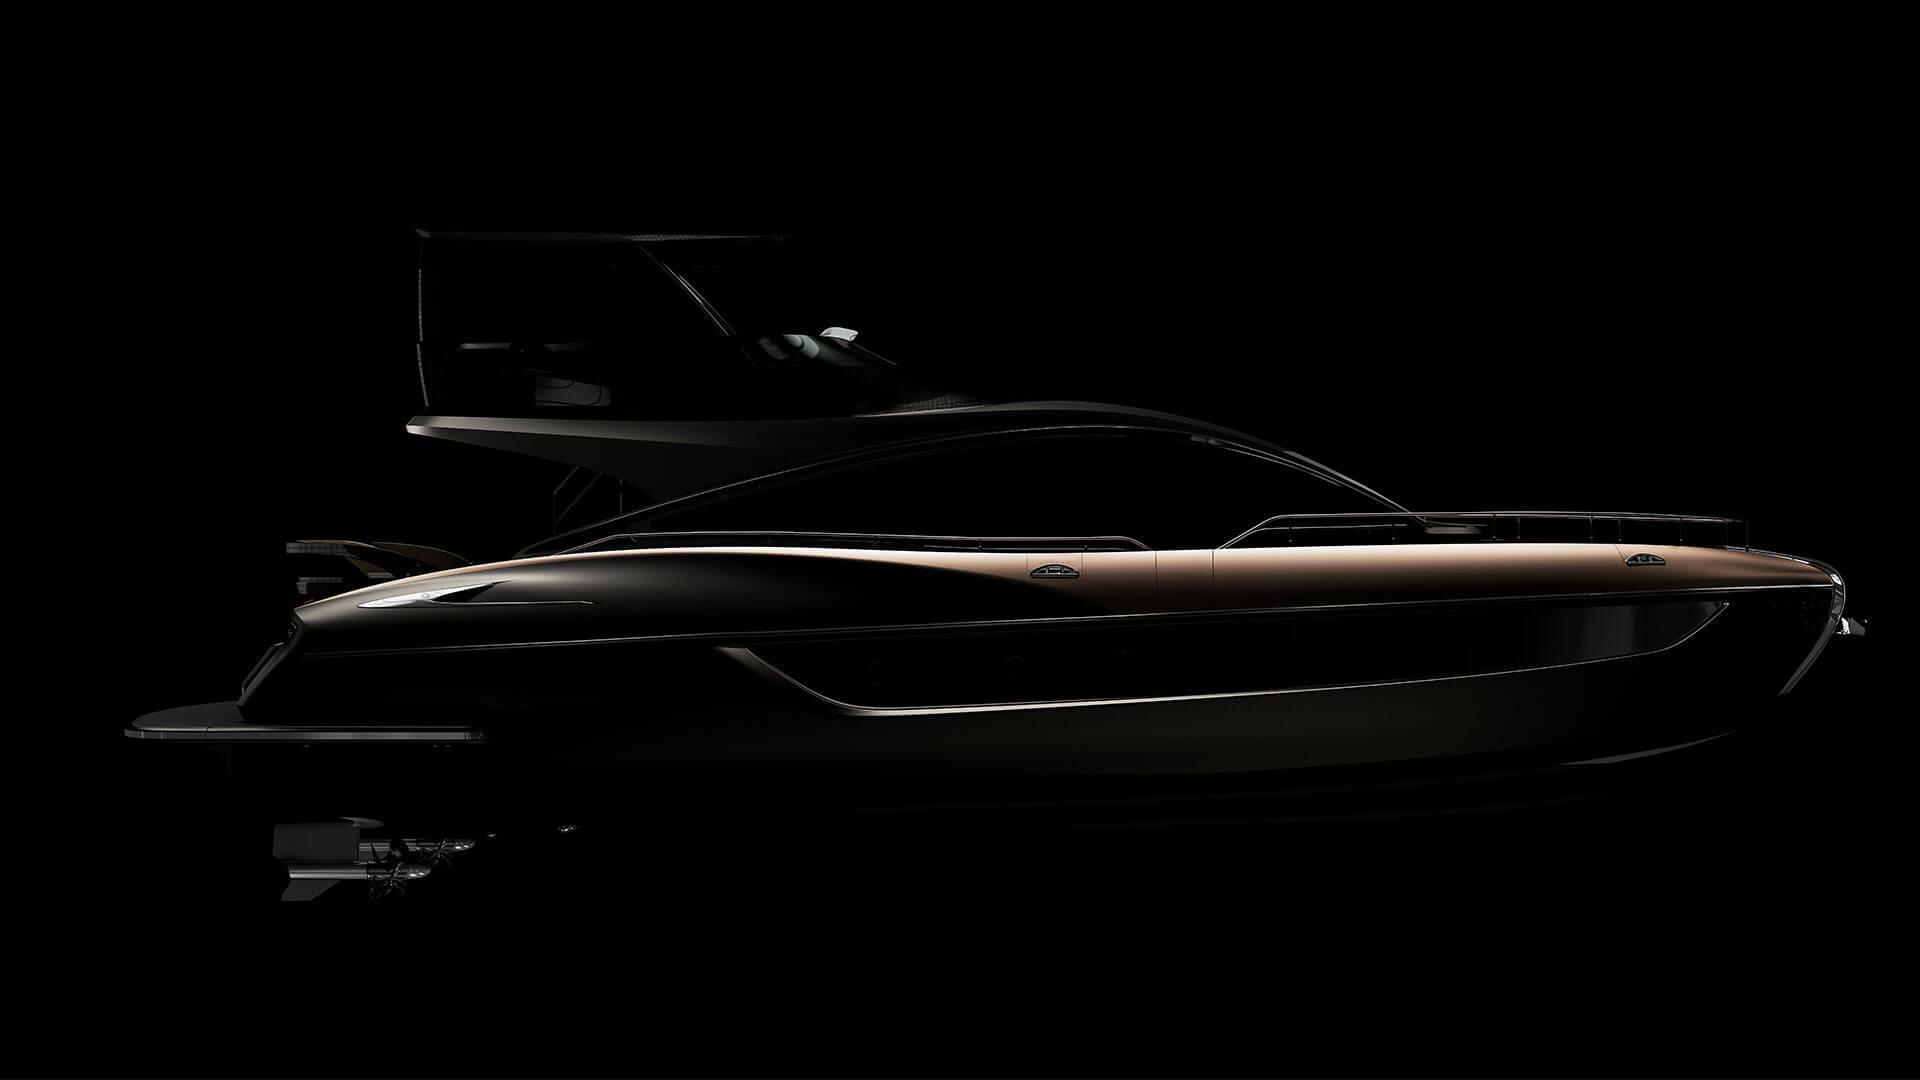 2019 lexus ly 650 luxury yacht gallery 09